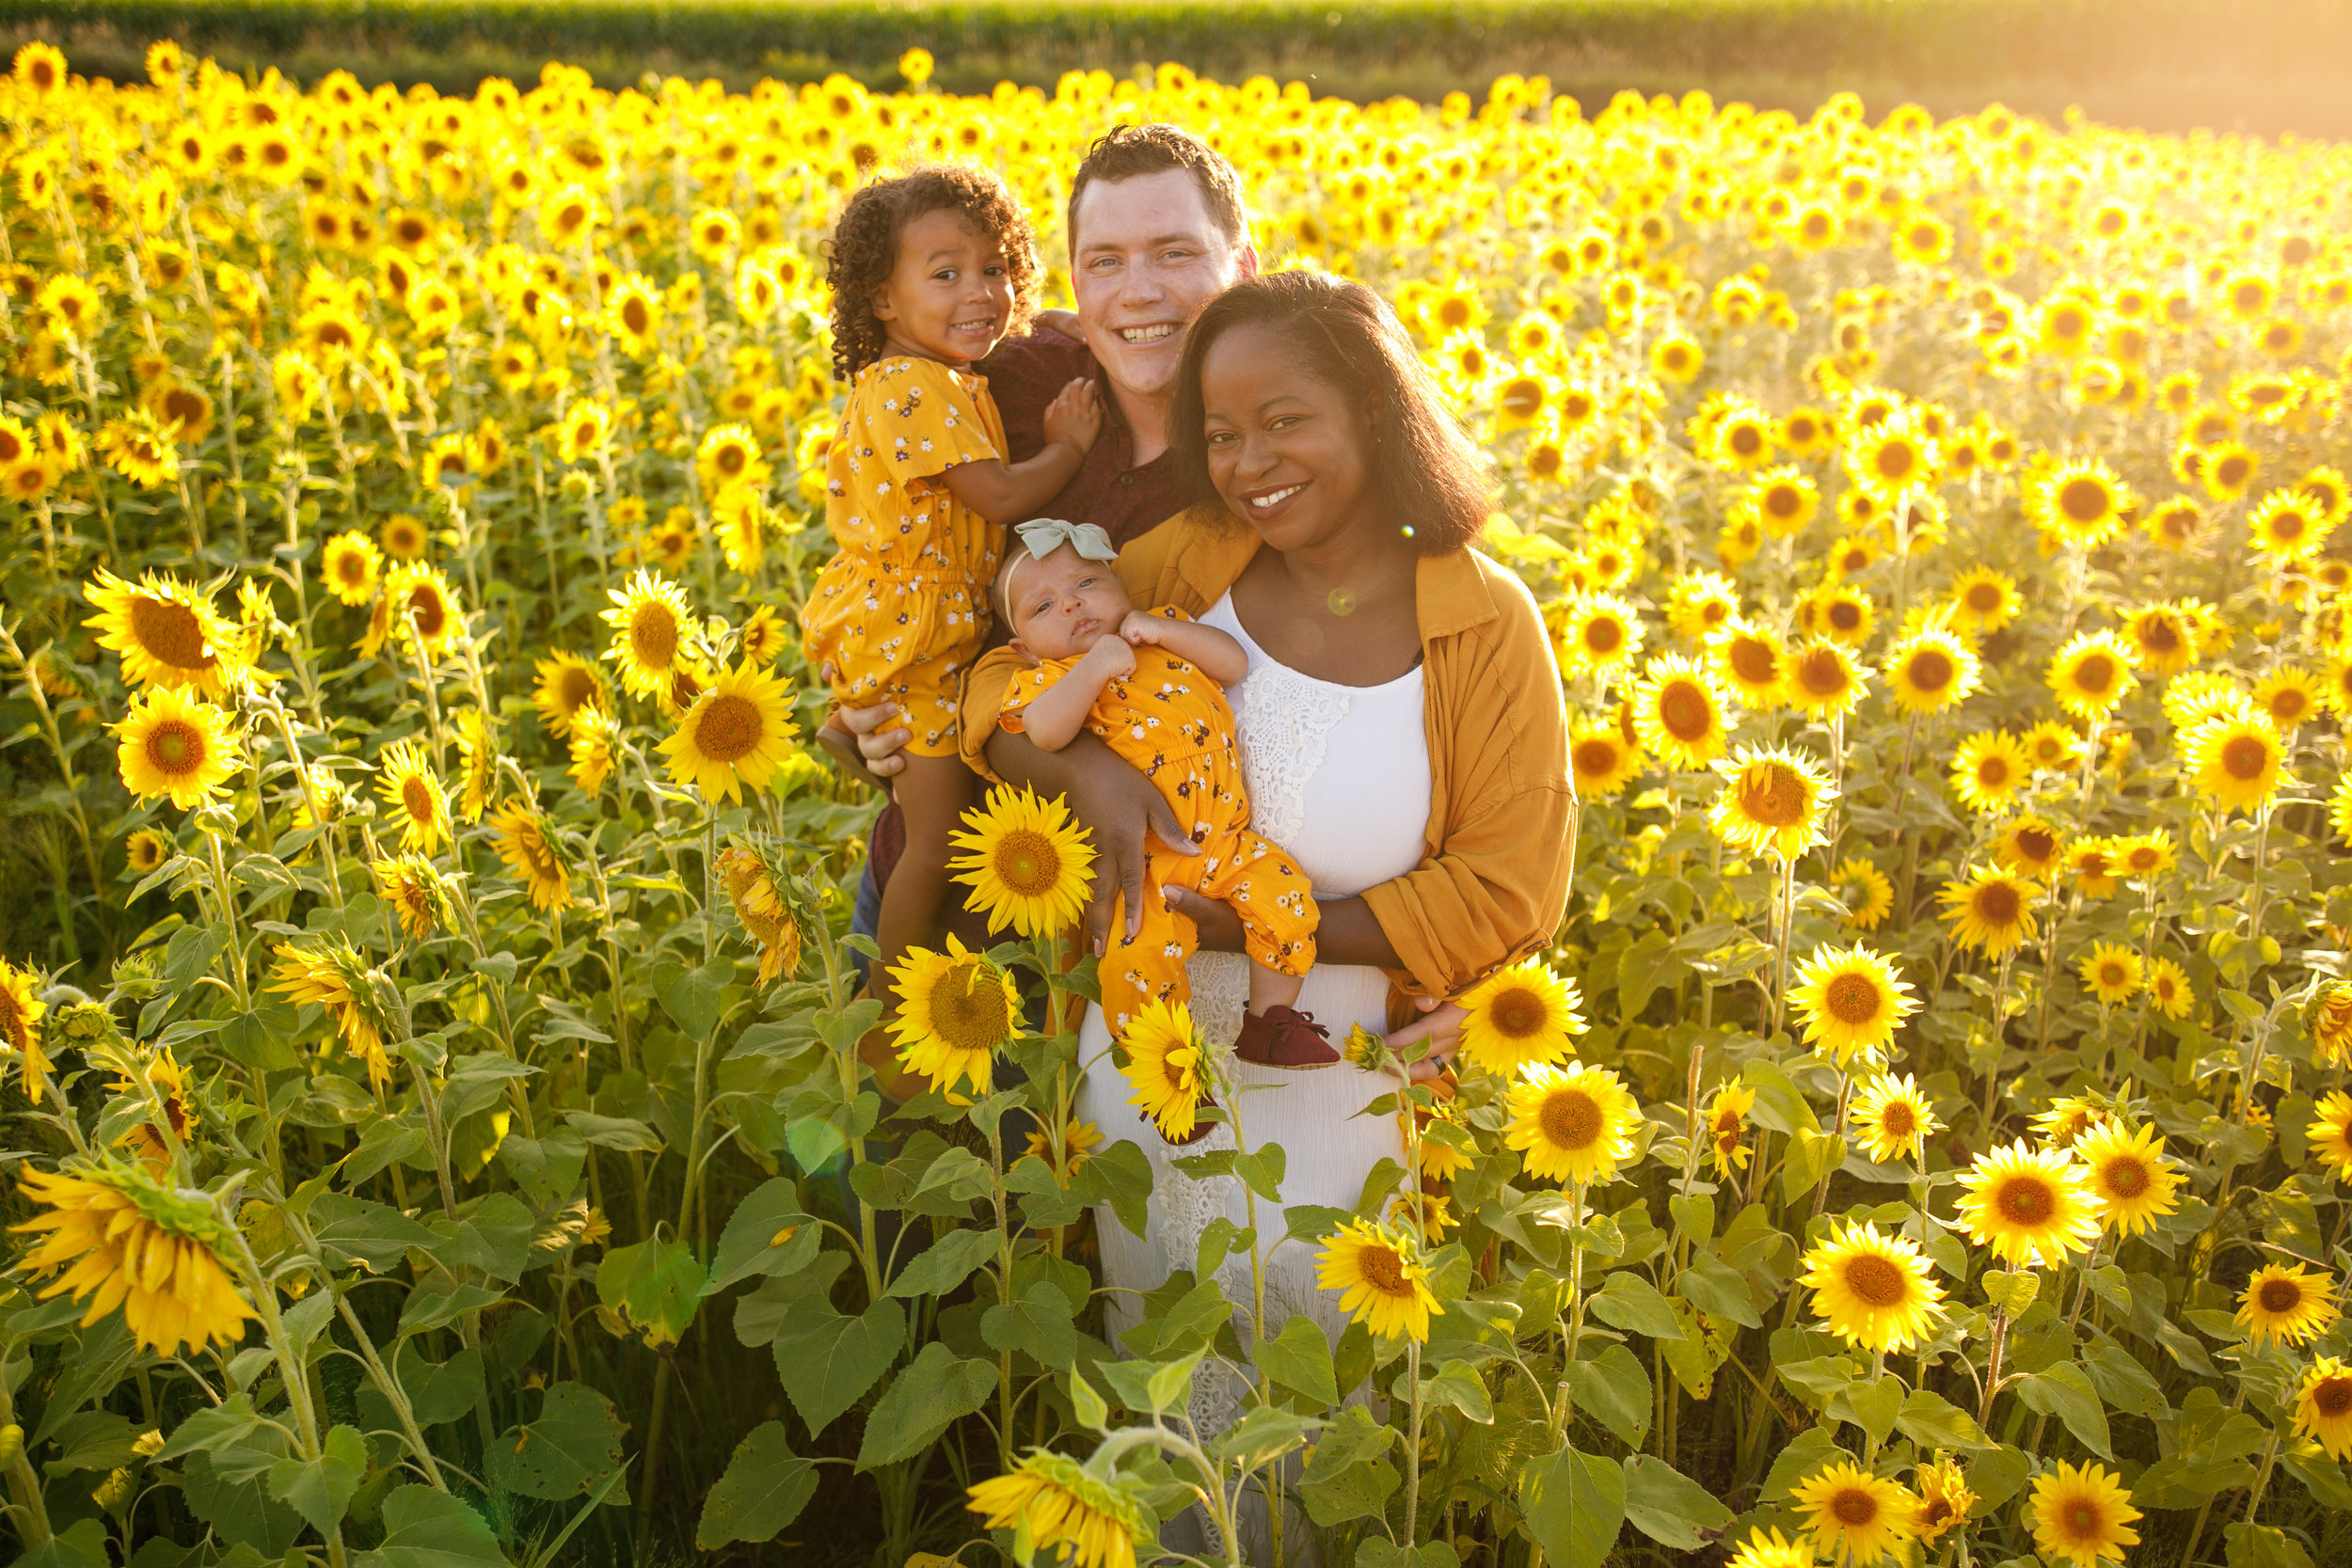 Morris Family Summer 2019 - Grand Rapids Photographer - Grand Rapids Family Photographer - Ed Dunneback and Girls - J Darling Photo 015.jpg